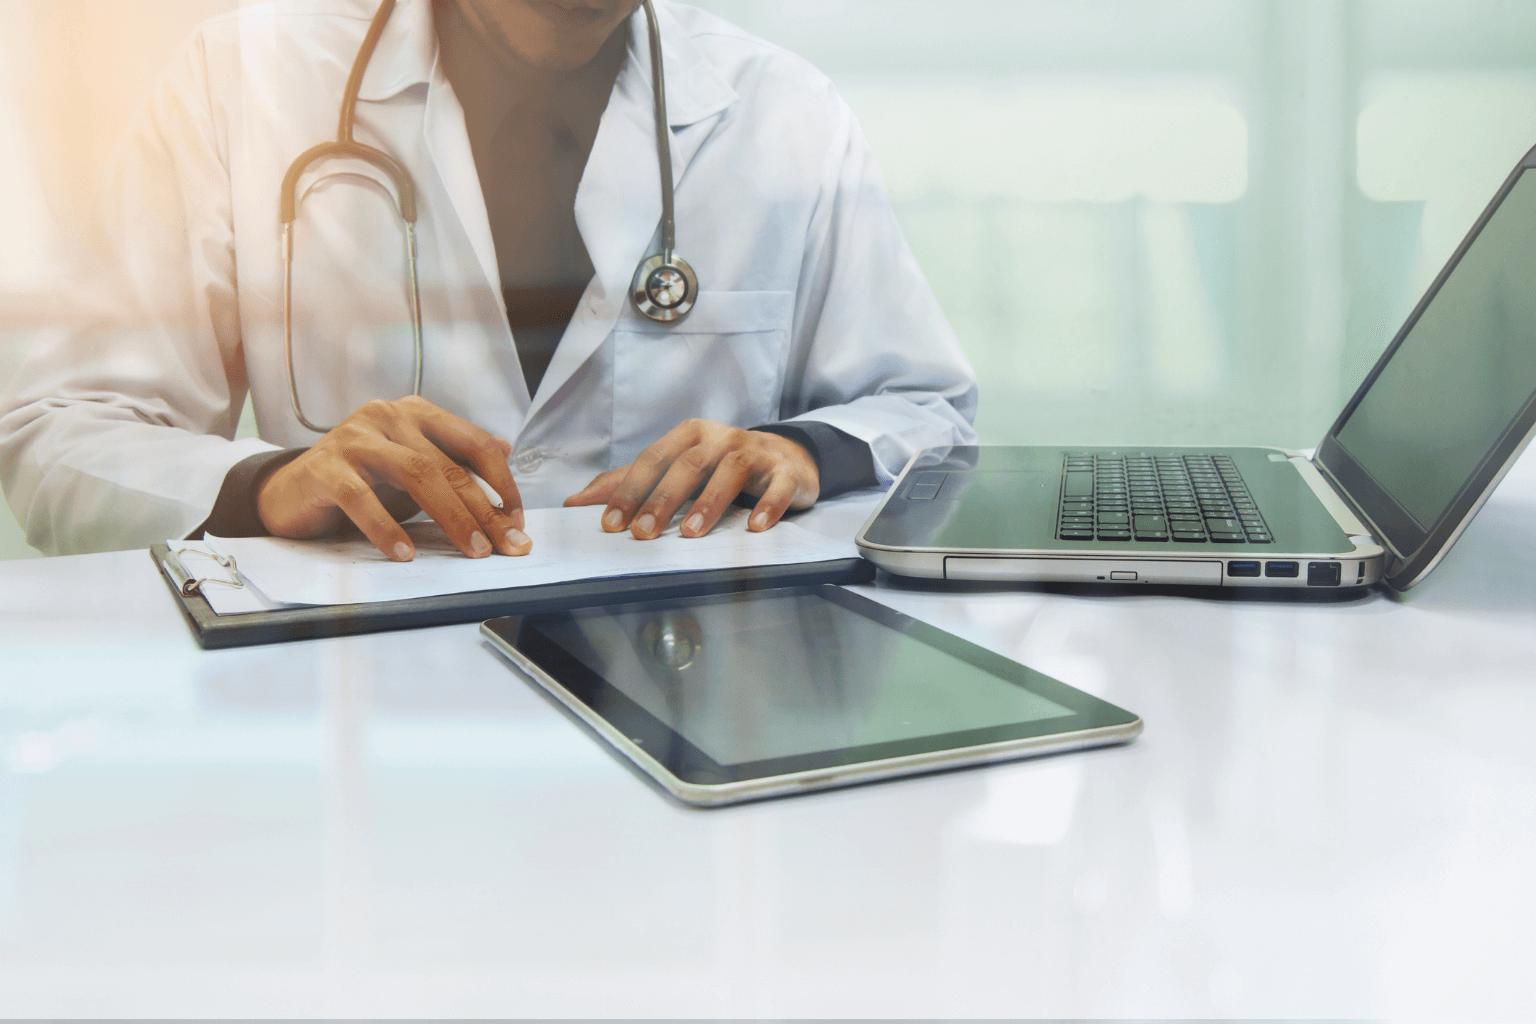 Pediatric resident diagnoses very rare case of neonatal diabetes mellitus